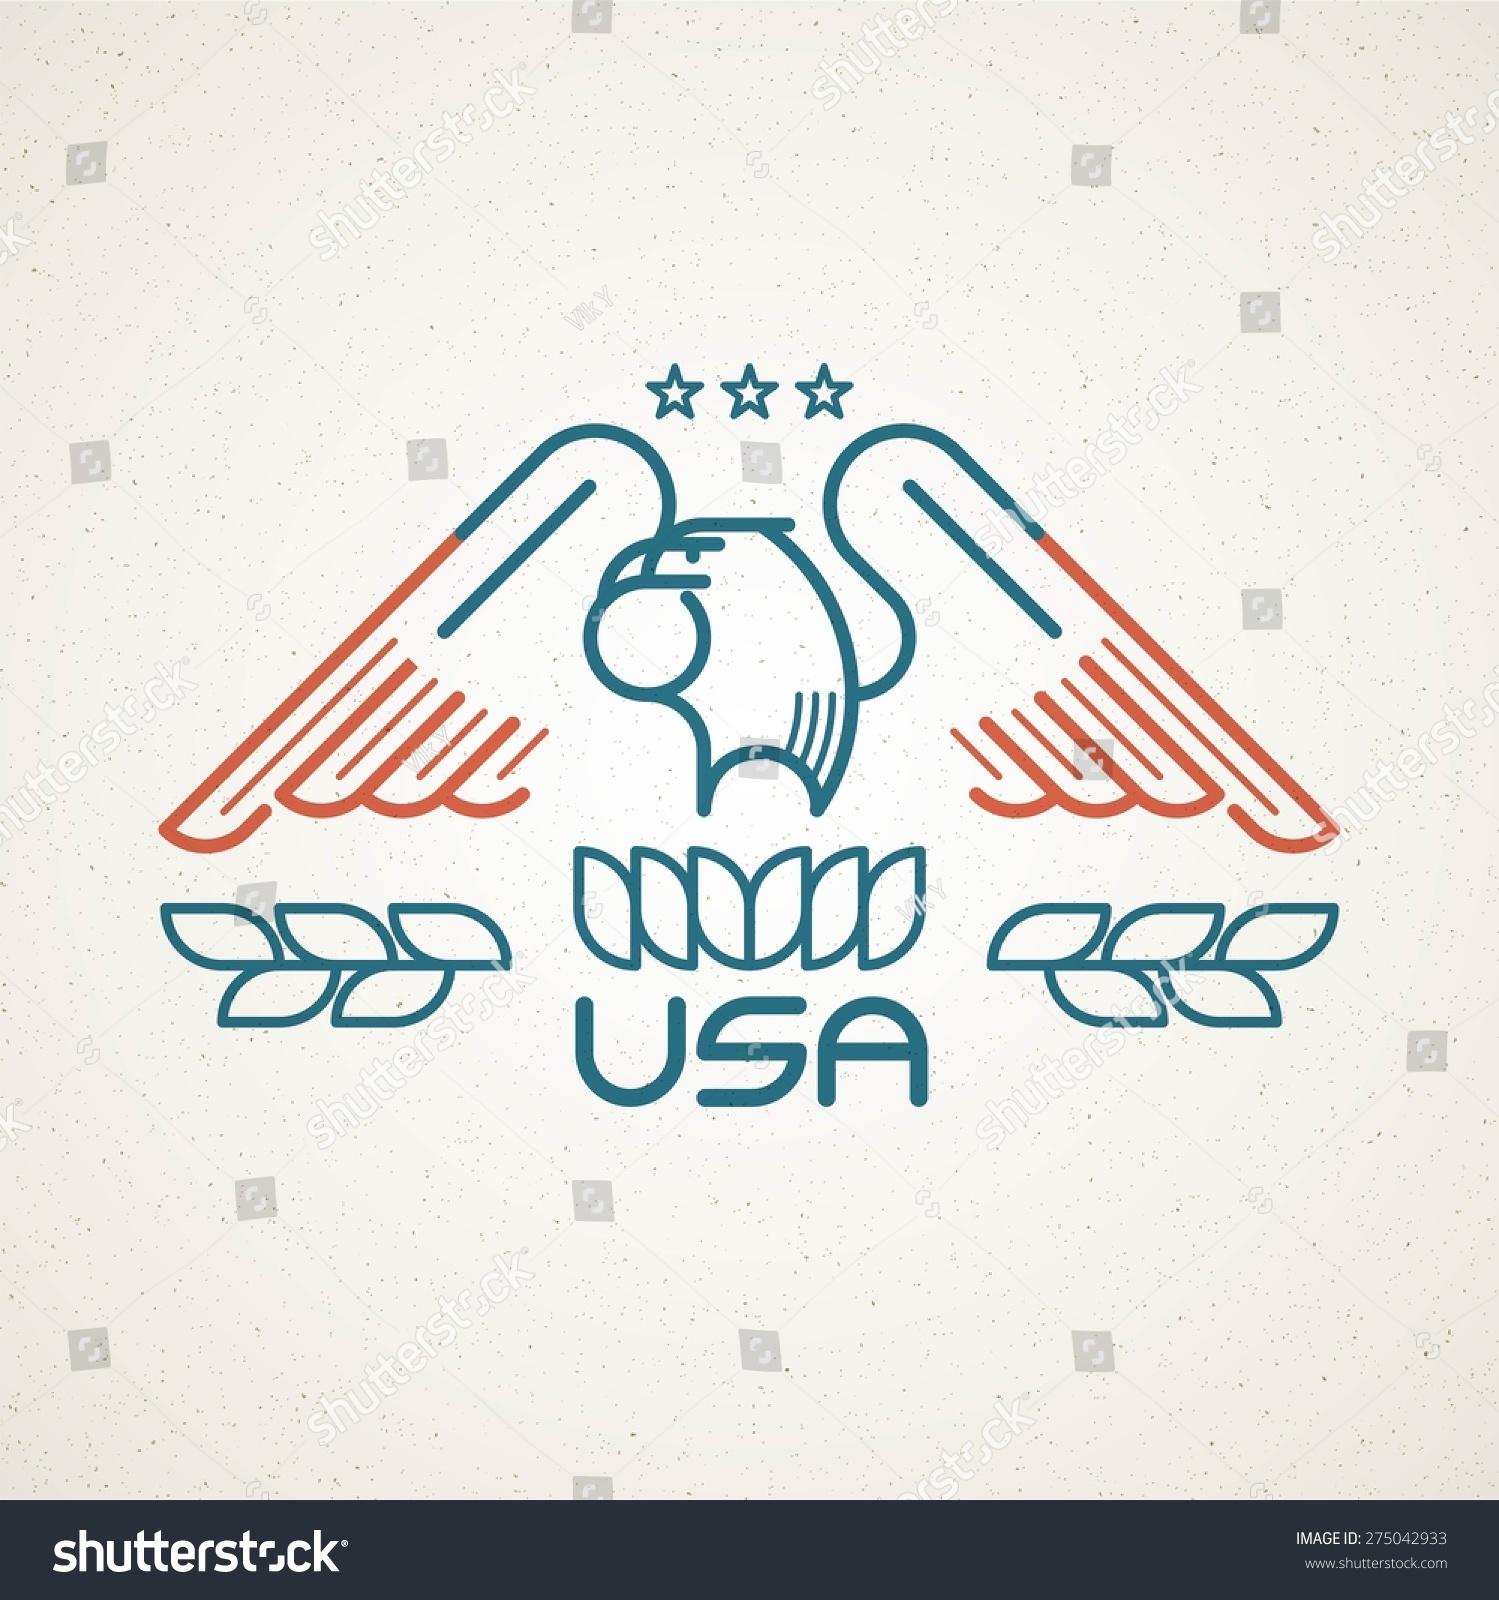 Made usa symbol american flag eagle stock vector 275042933 made in the usa symbol with american flag and eagle templates emblems vector illustration buycottarizona